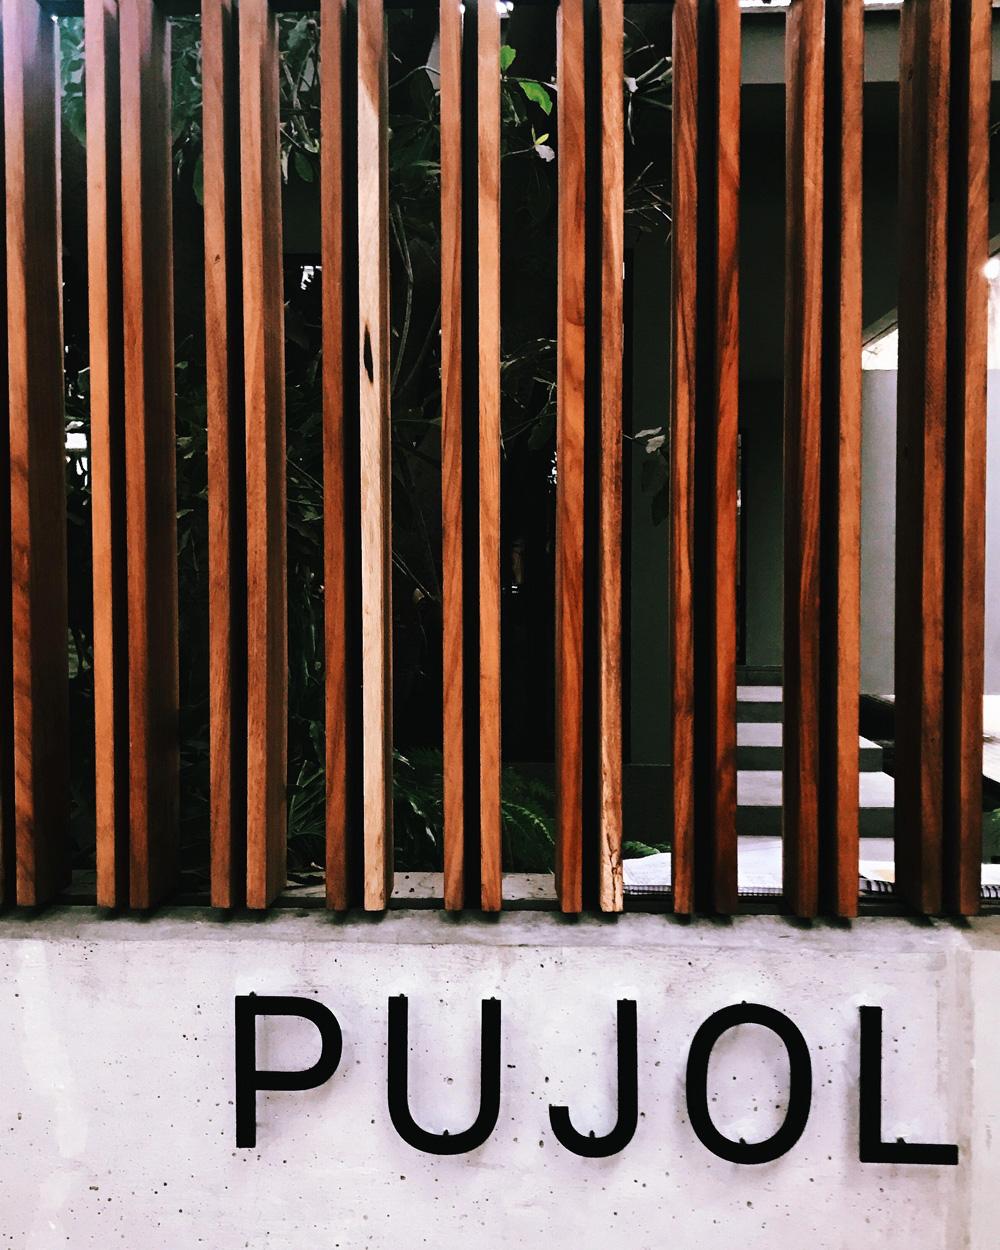 pujol-mexicocity.jpg